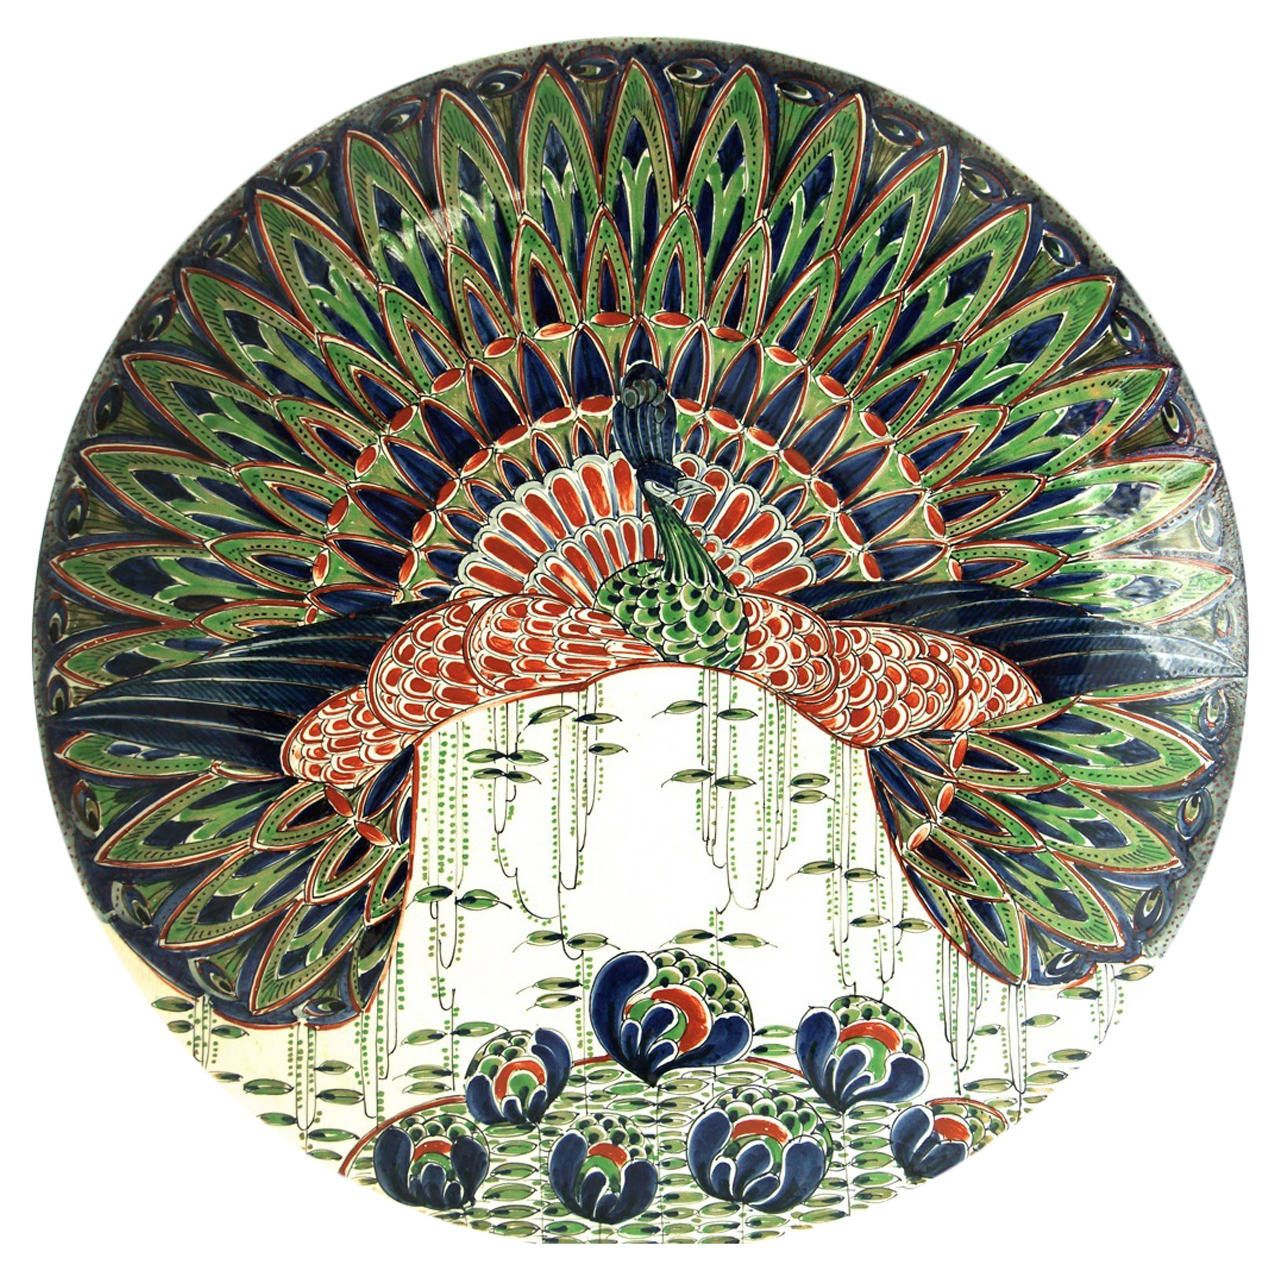 Art Nouveau Ceramic Wall Plate | 1stdibs.com  sc 1 st  Pinterest & Art Nouveau Ceramic Wall Plate | Ceramic art